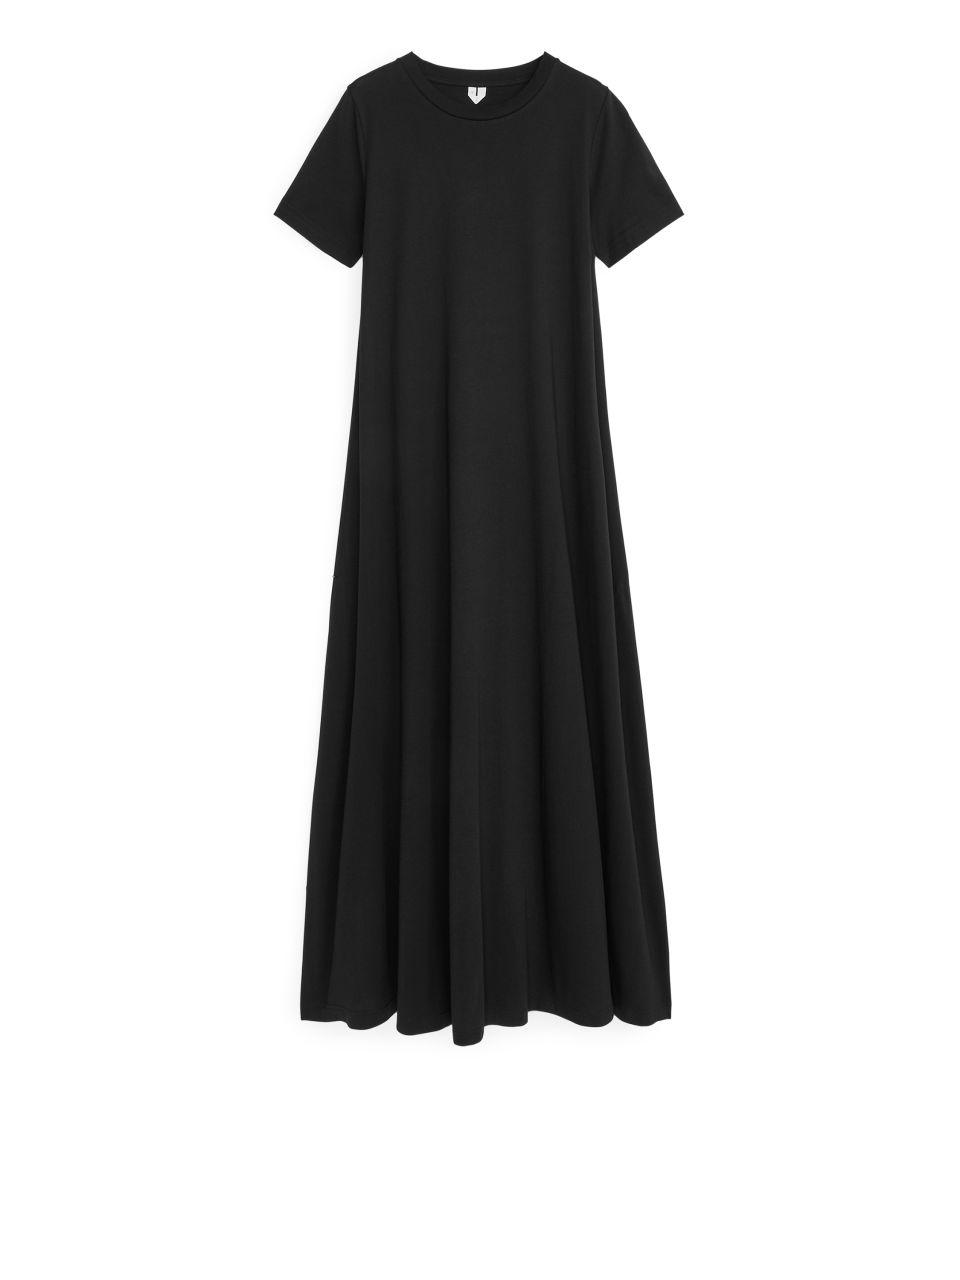 Long T-shirt Dress - Black